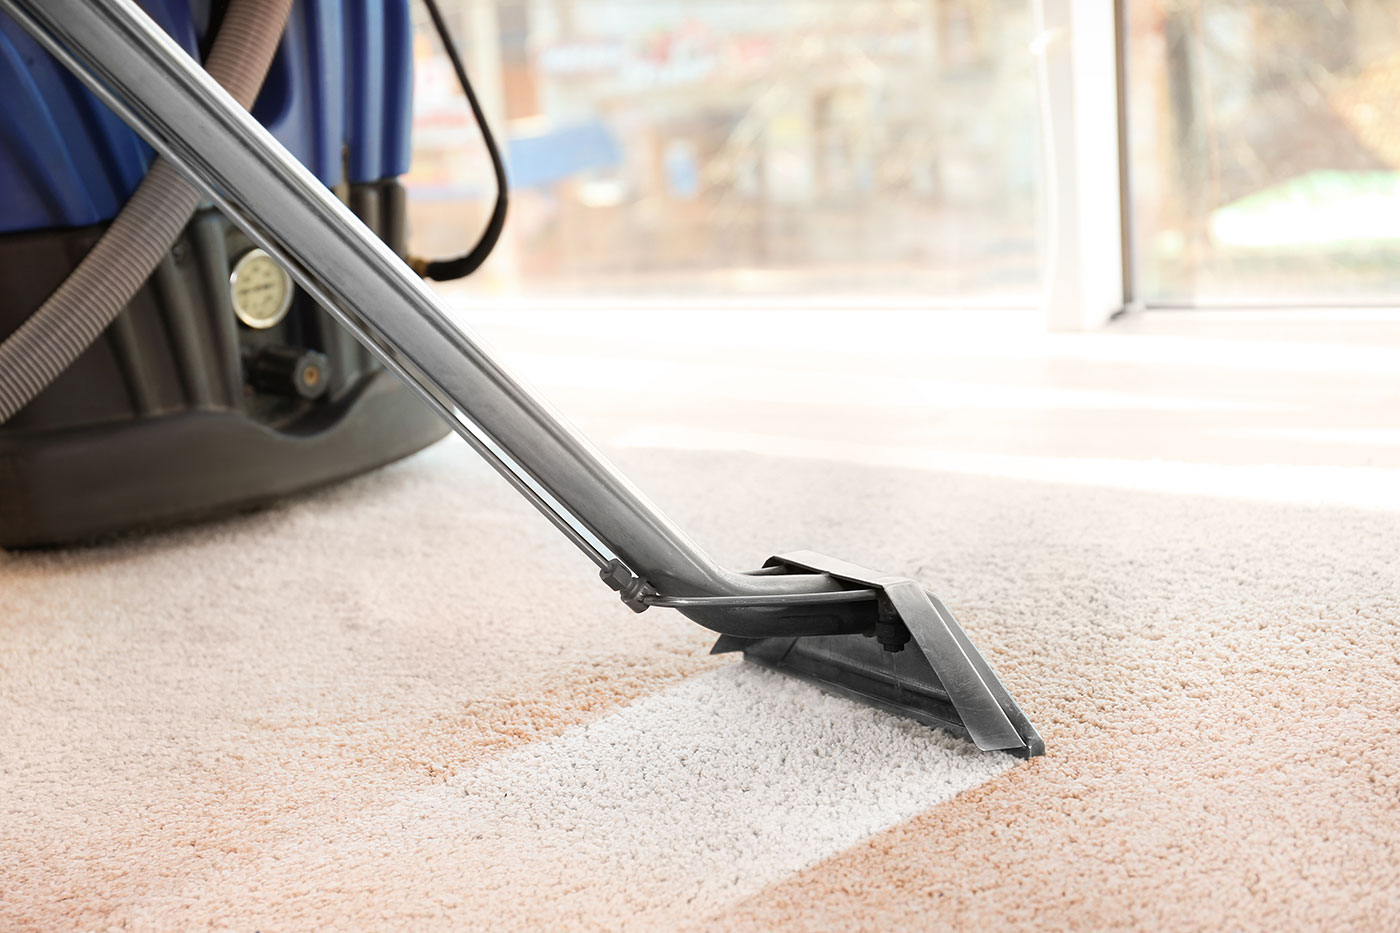 Make your carpet look new again